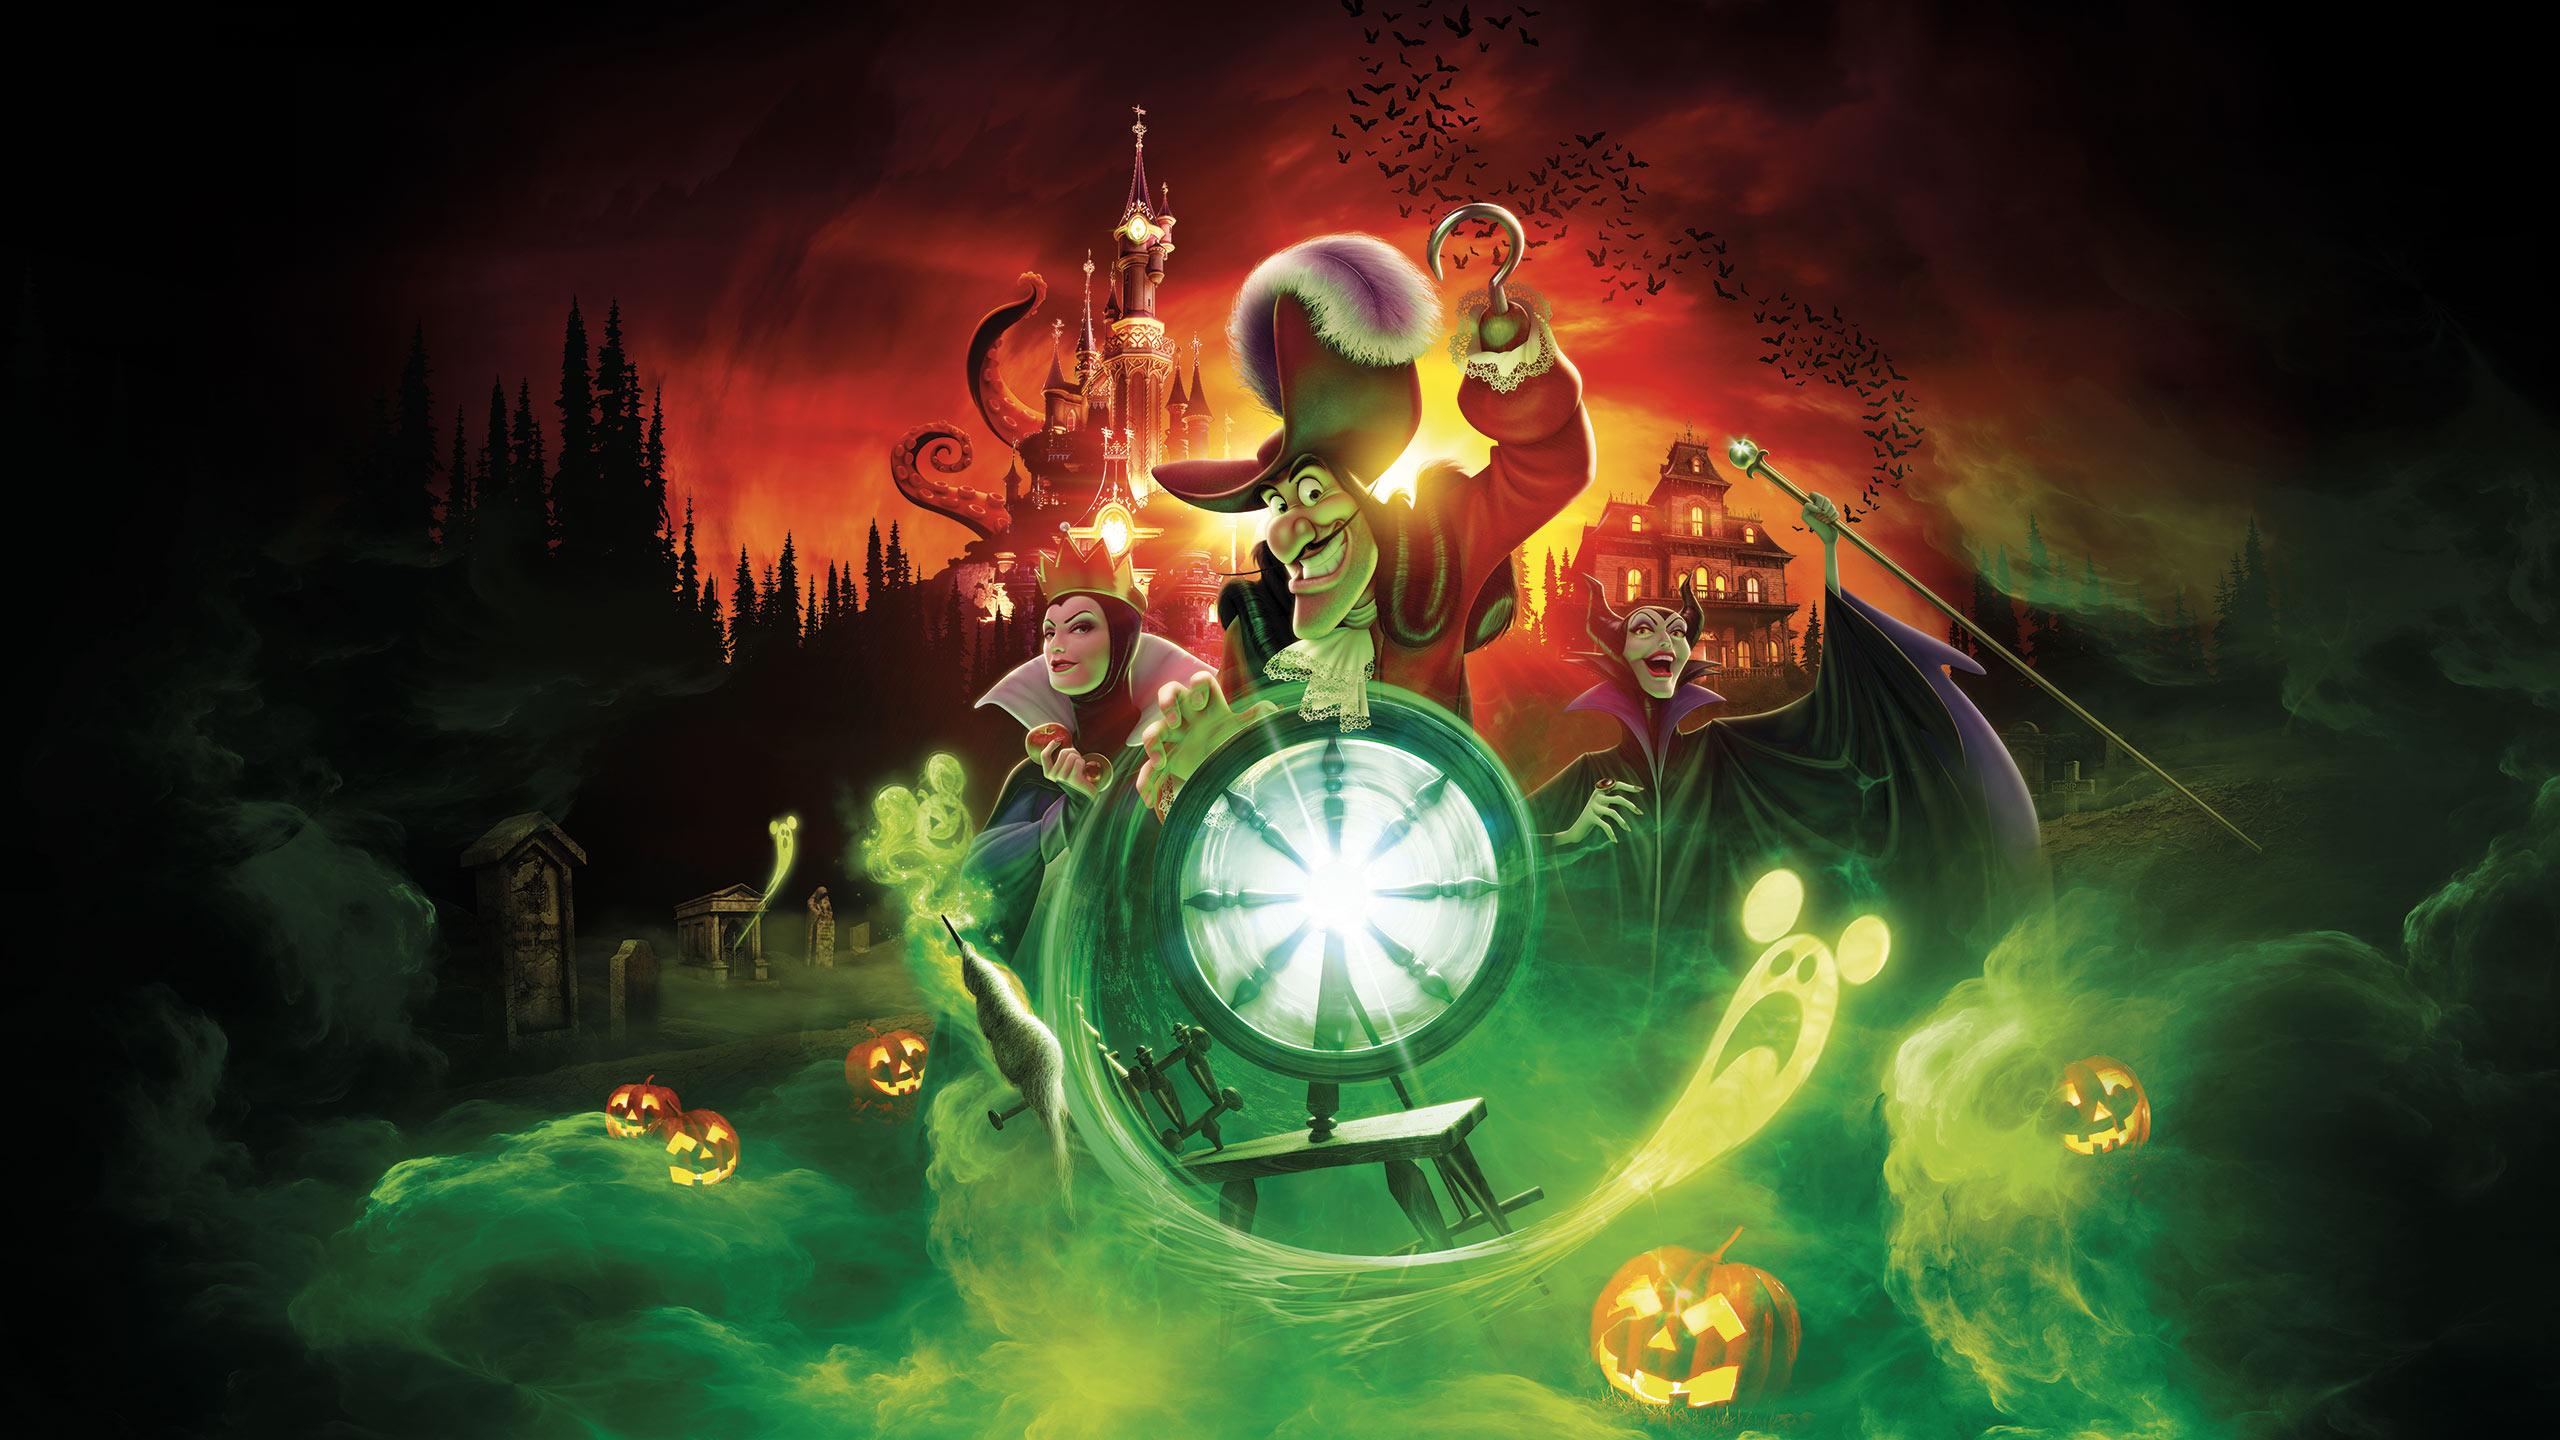 Saison Halloween Disneyland Paris 2020 Festival Halloween 2020 : les informations ! | Disneyland Paris